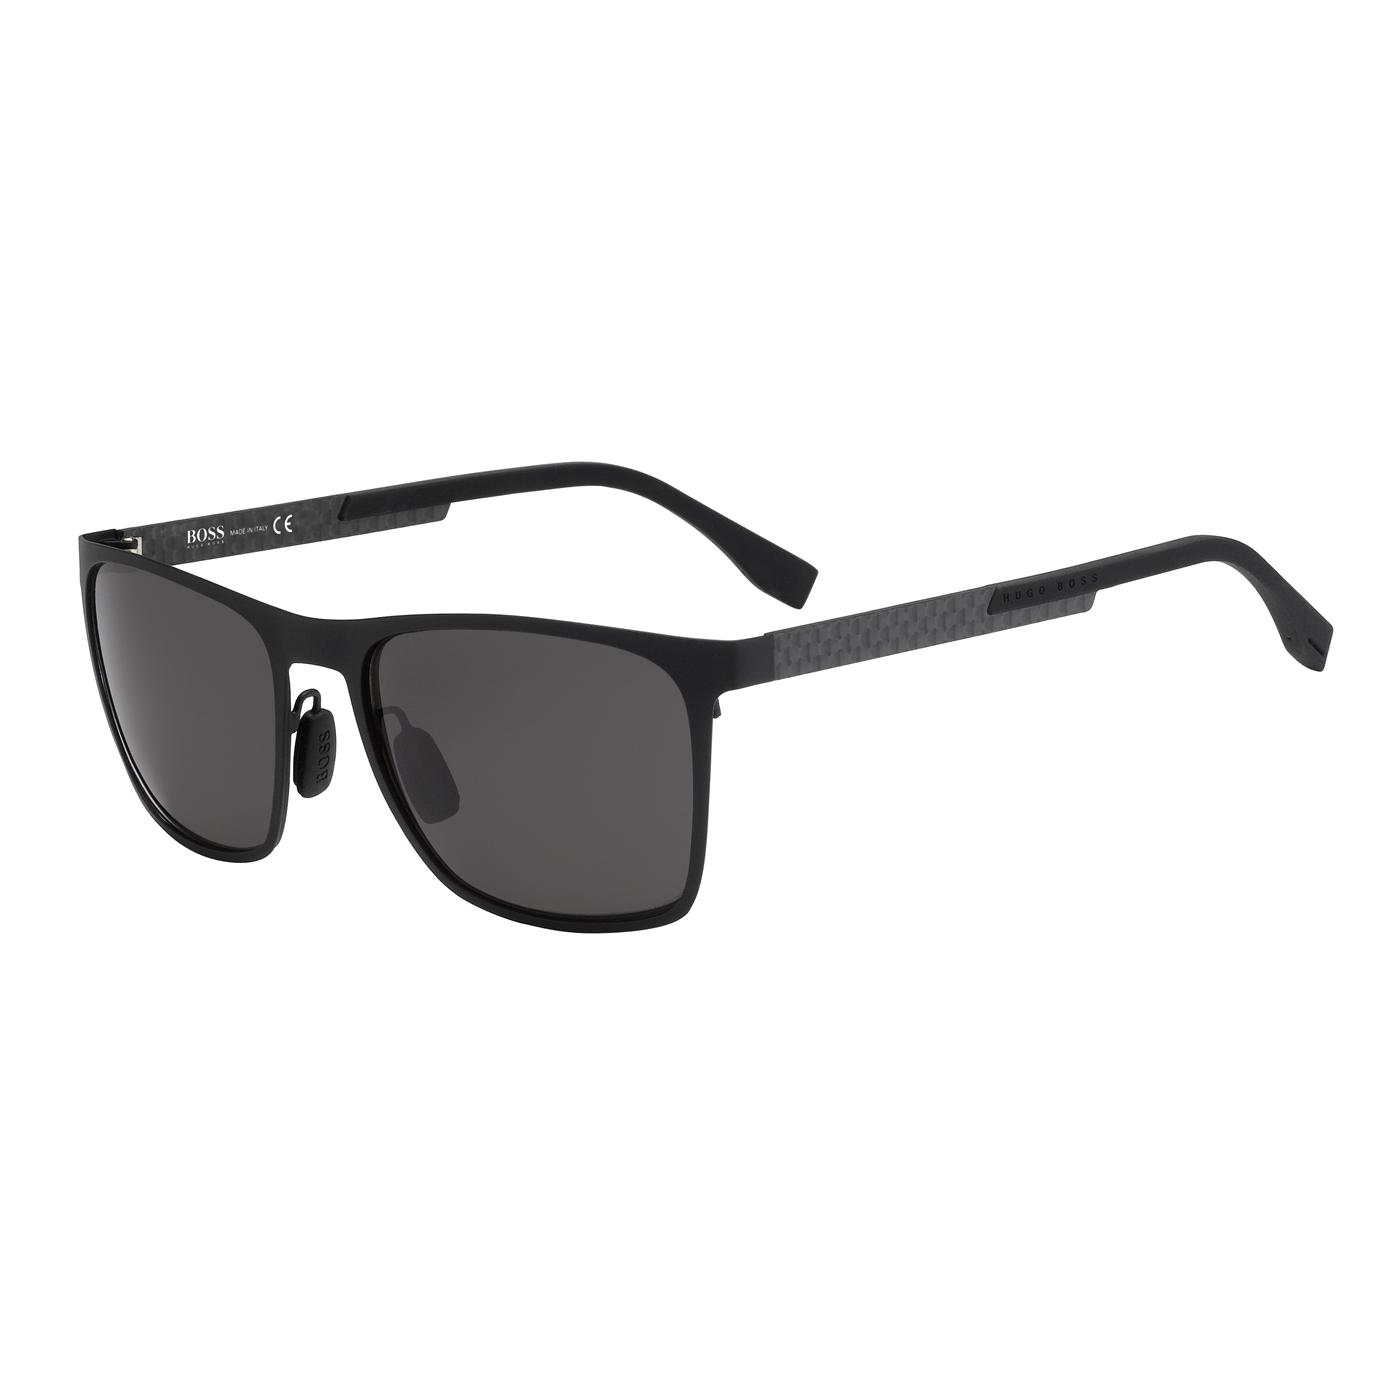 Bilde av Boss Black Carbon Sunglasses BOSS 0732S KCQ 57 Y1